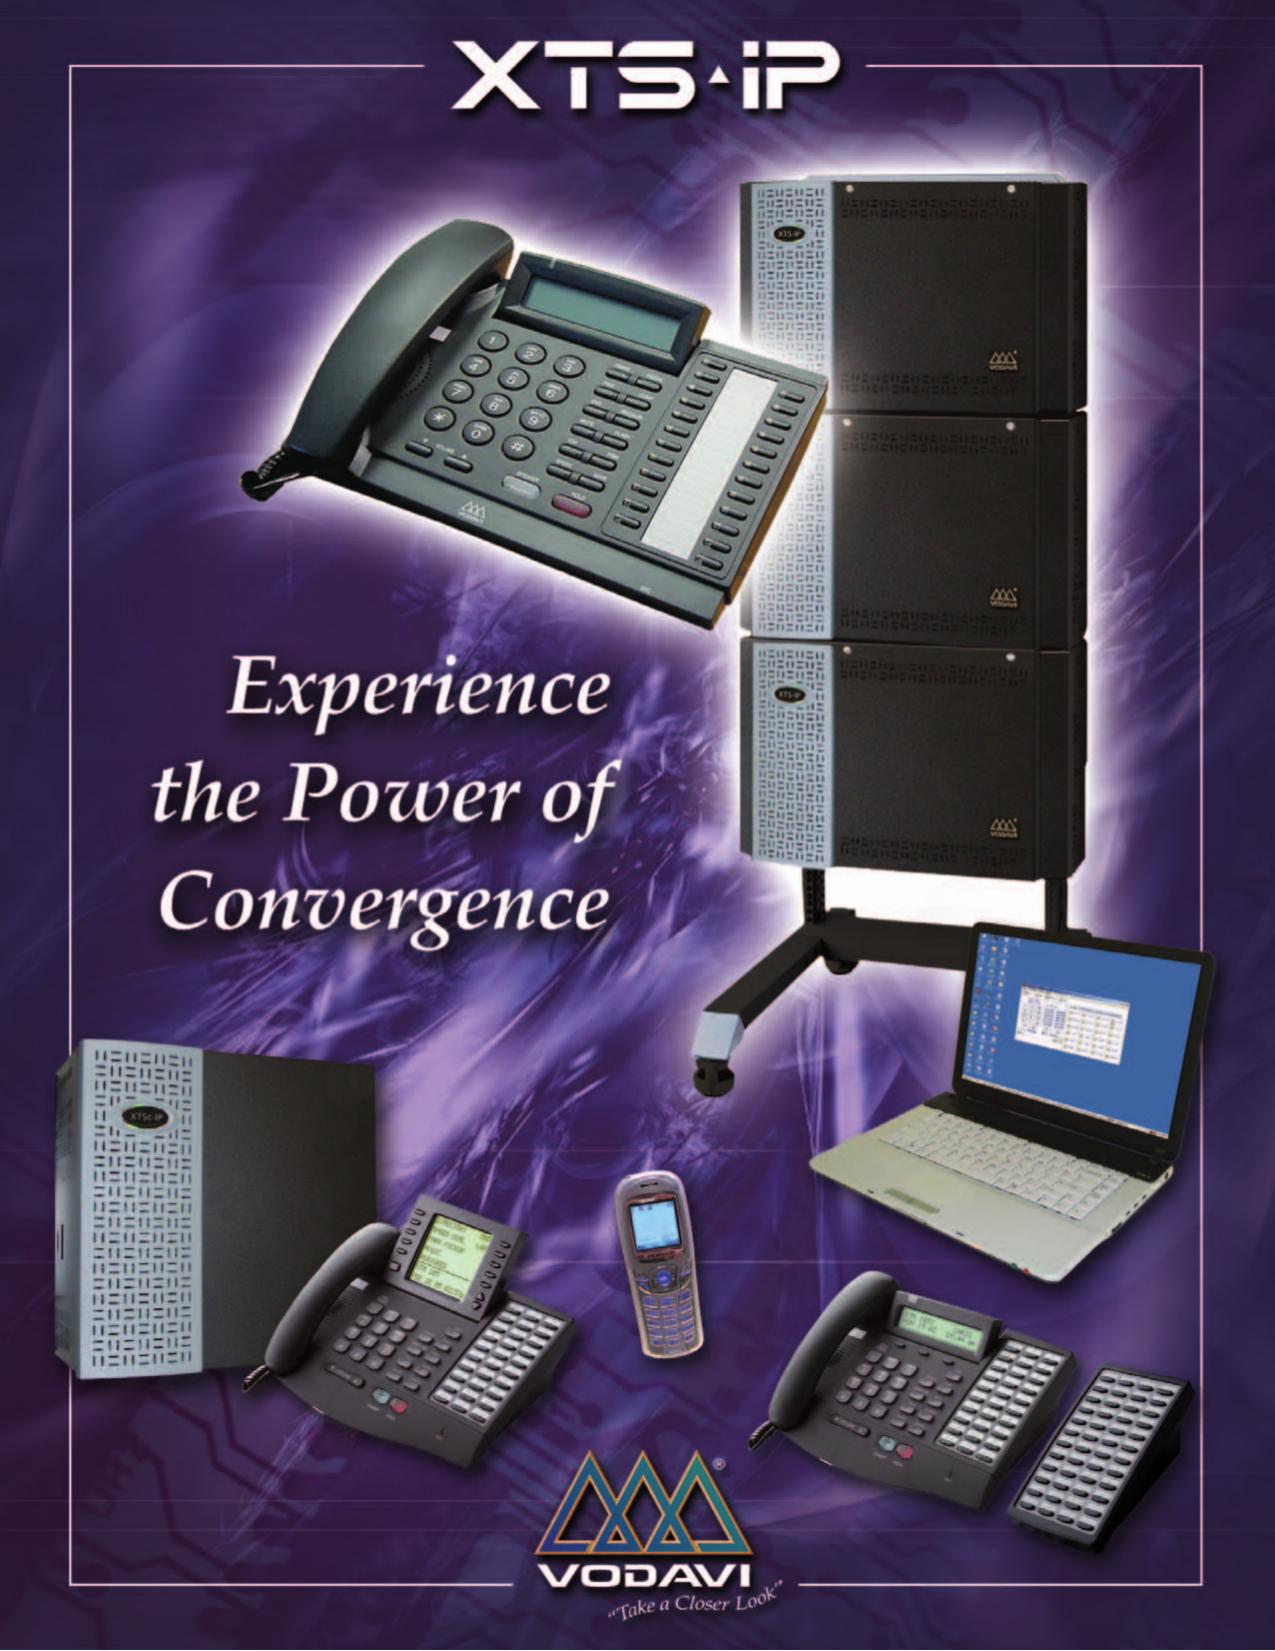 Download free pdf for vodavi xts-ip telephone manual.